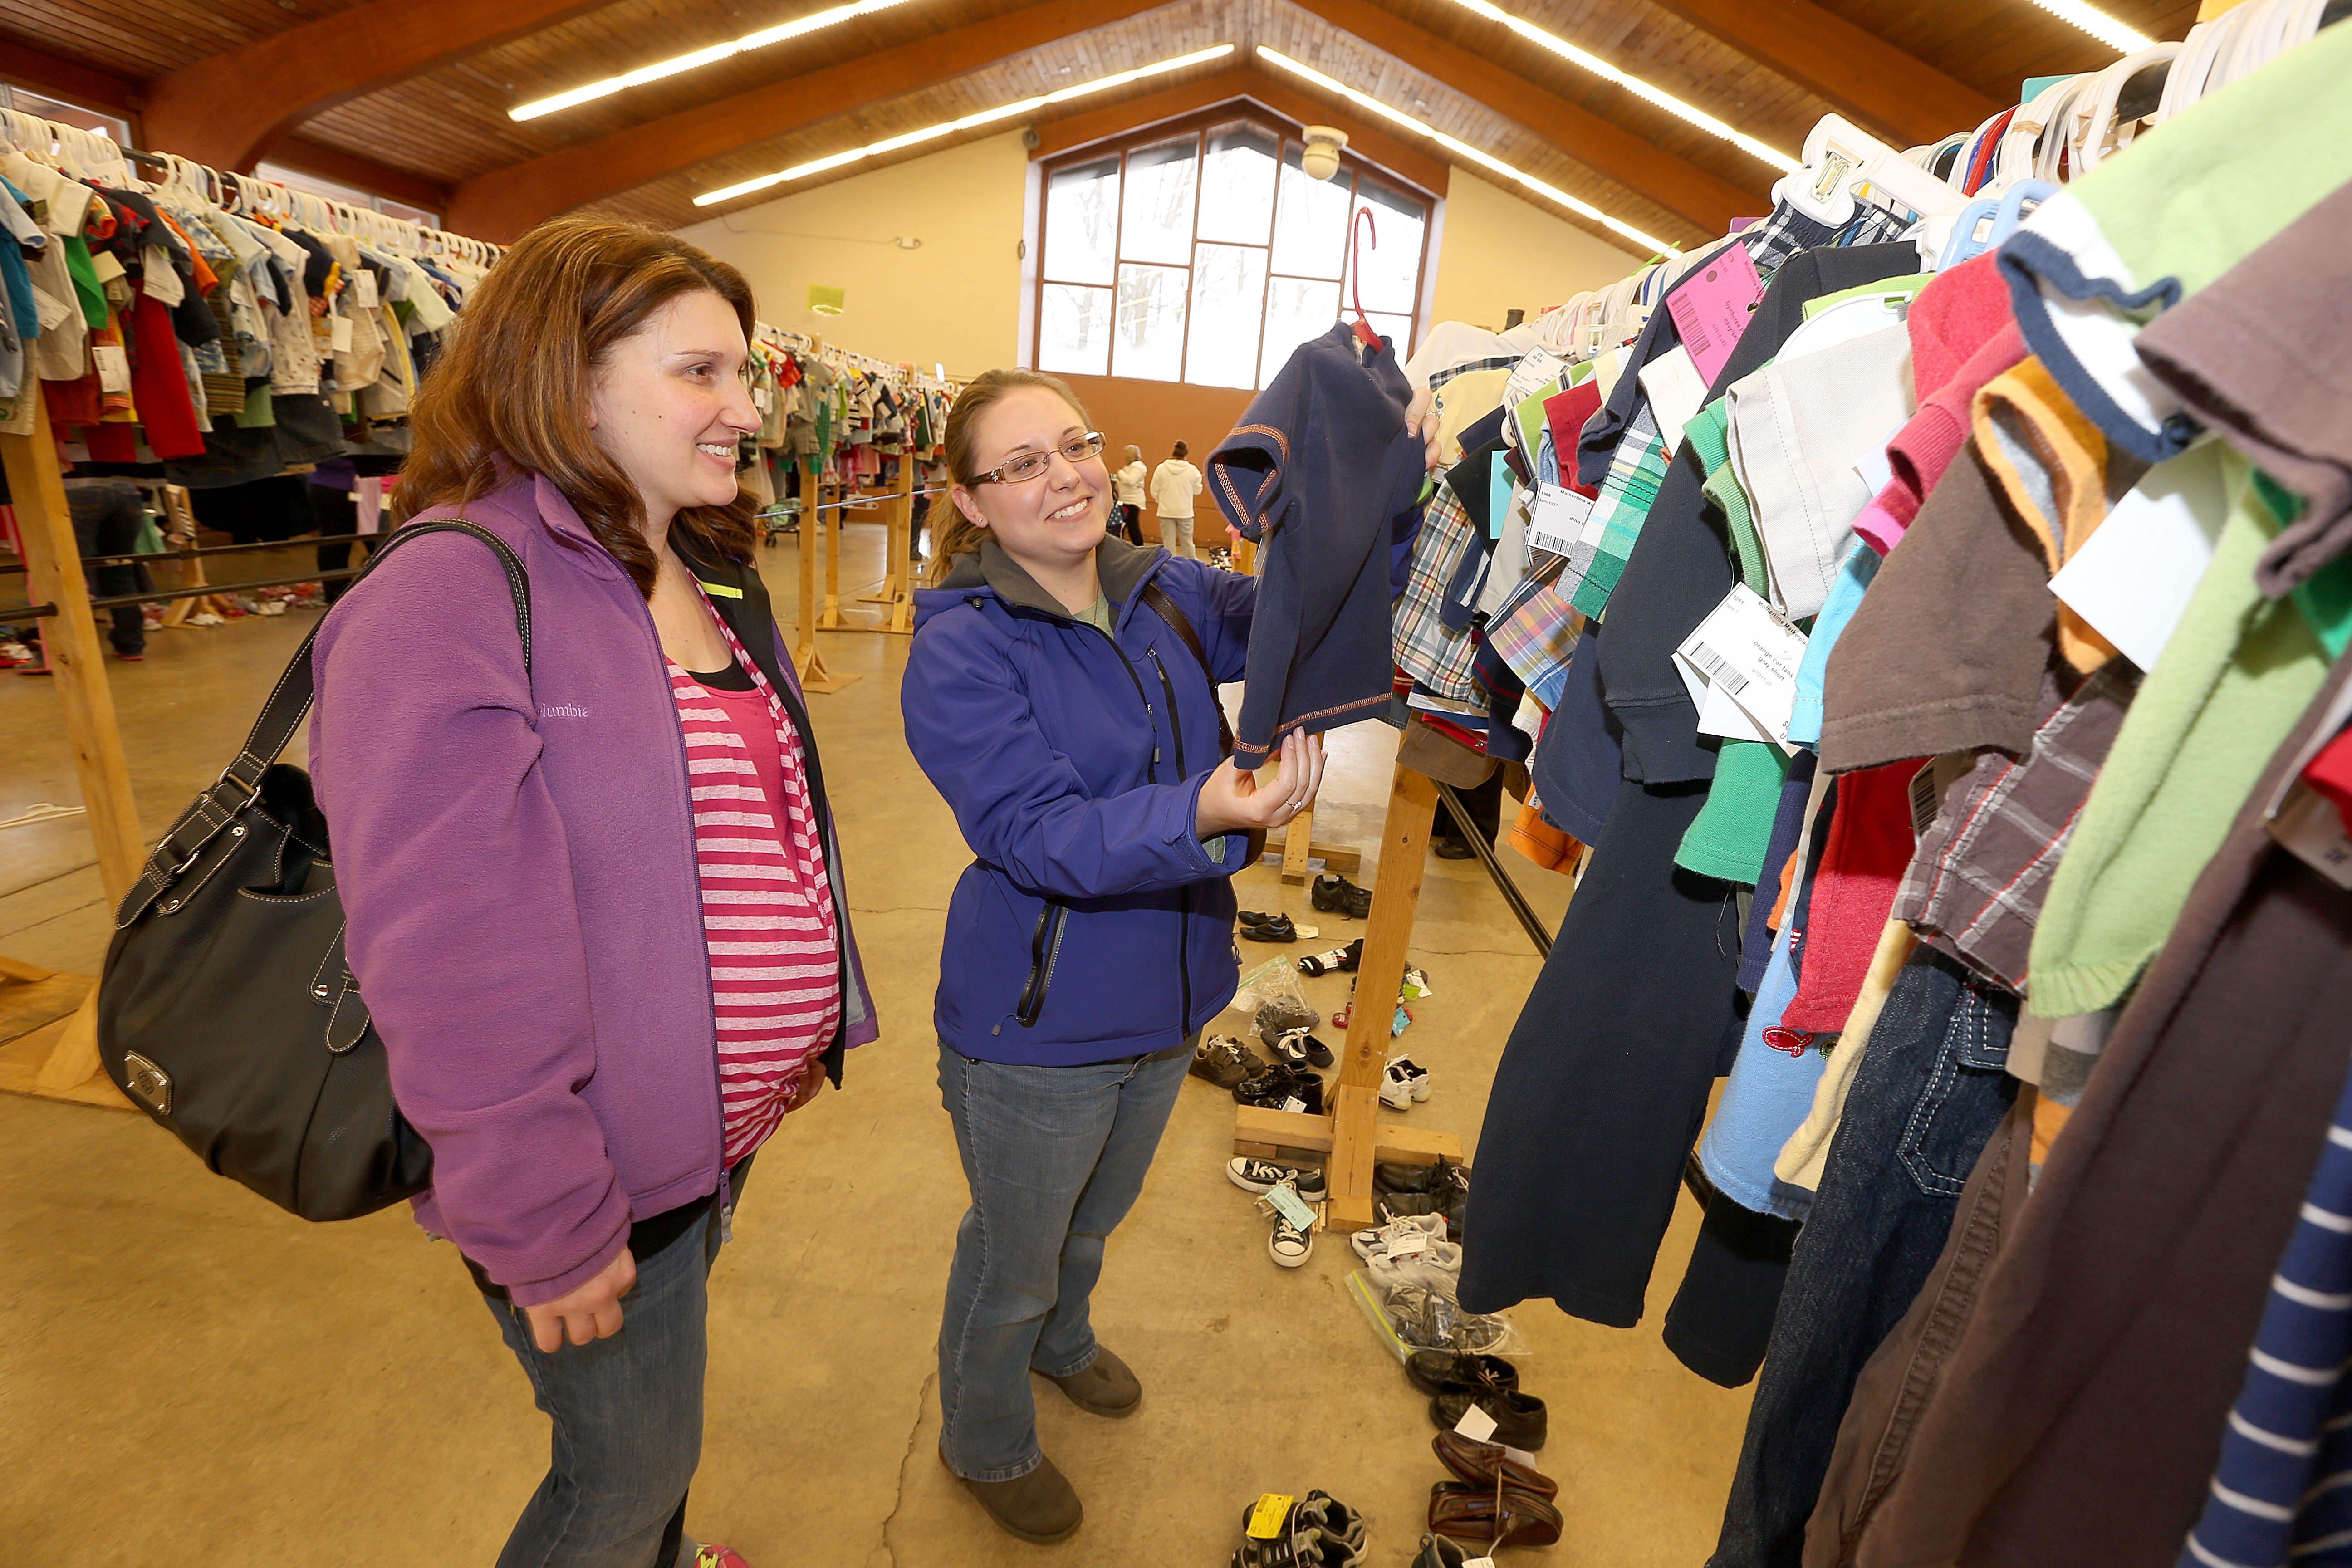 Future mother Claudia Kochman, left, shops at the Buffalo Baby Expo with friend Samantha Niwinski on Saturday.